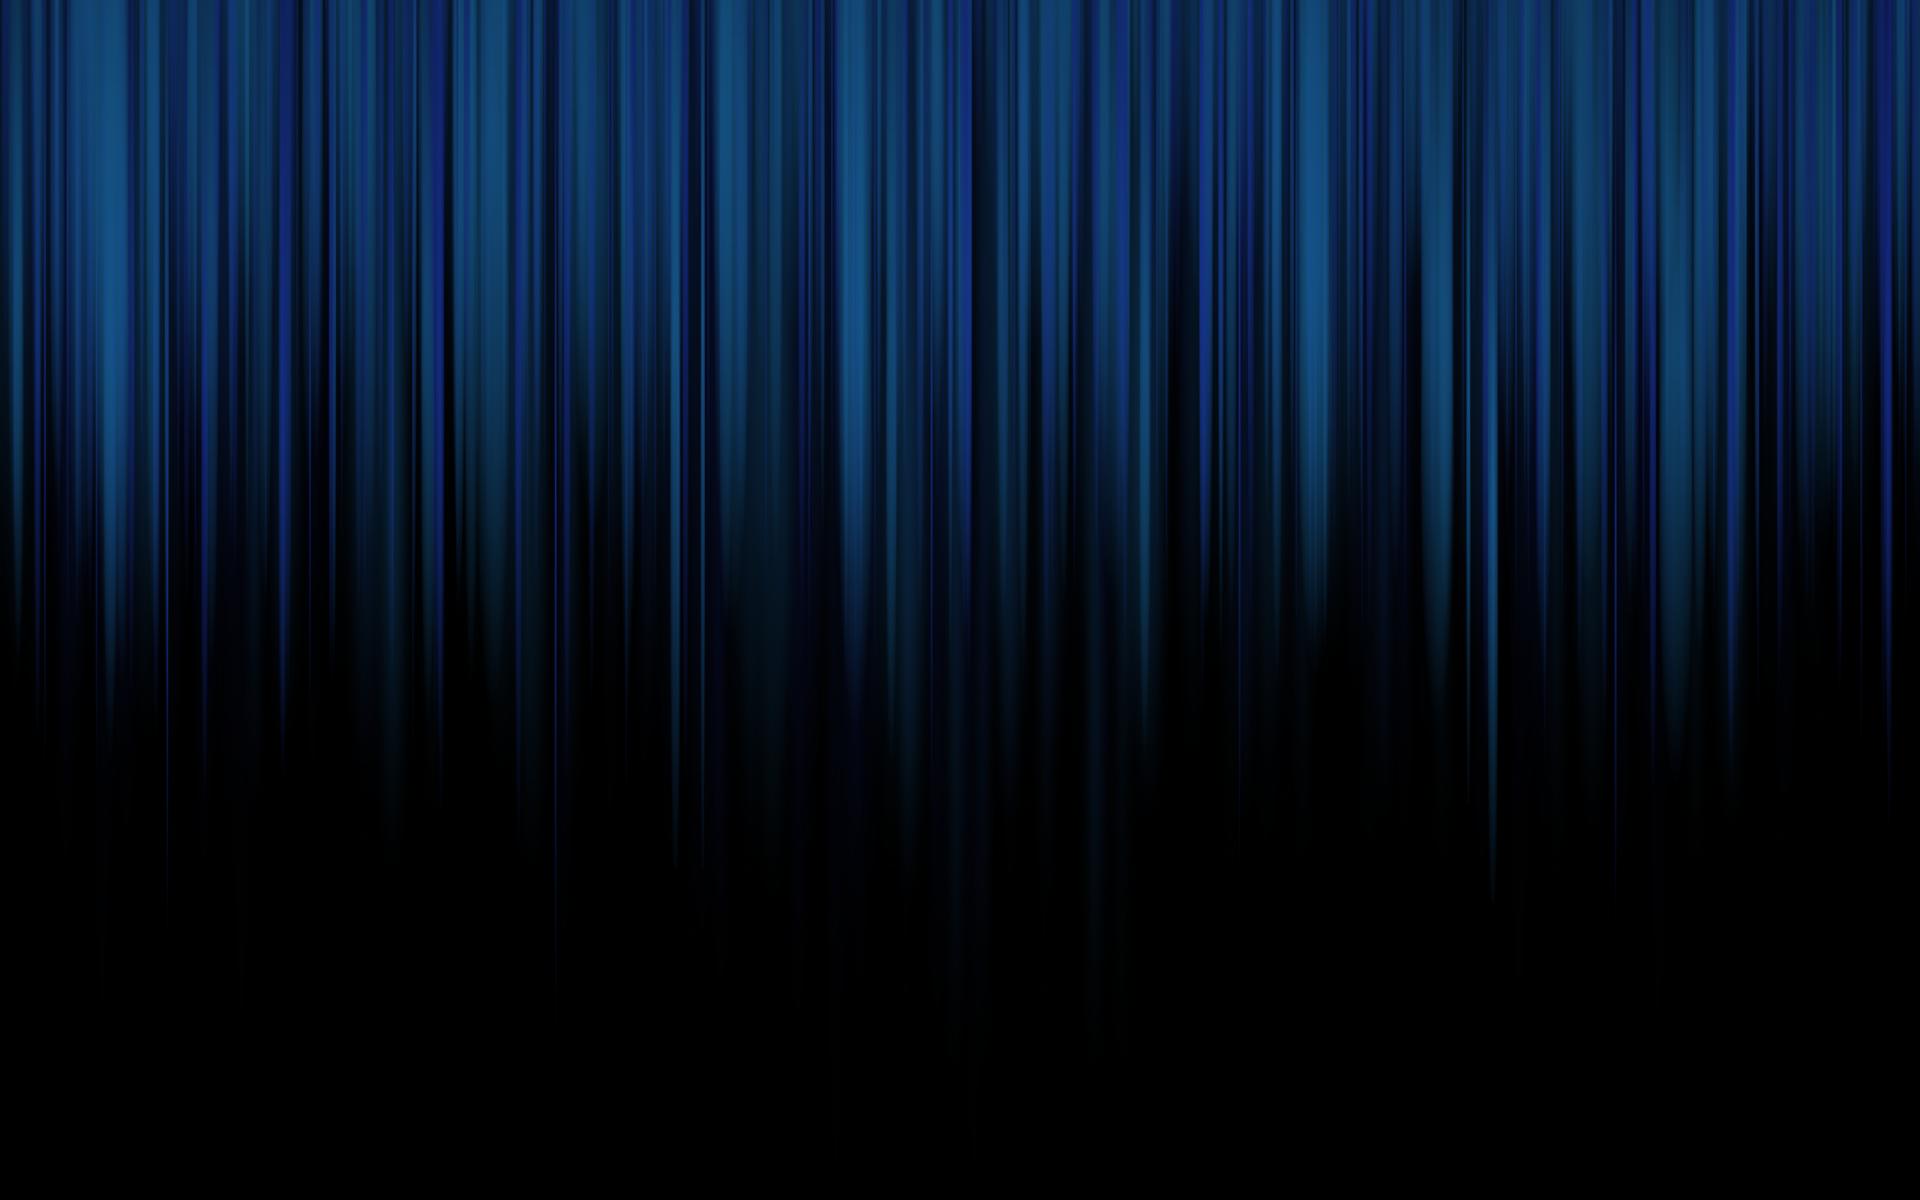 Blue Striped Wallpaper: Black And Blue Desktop Wallpaper